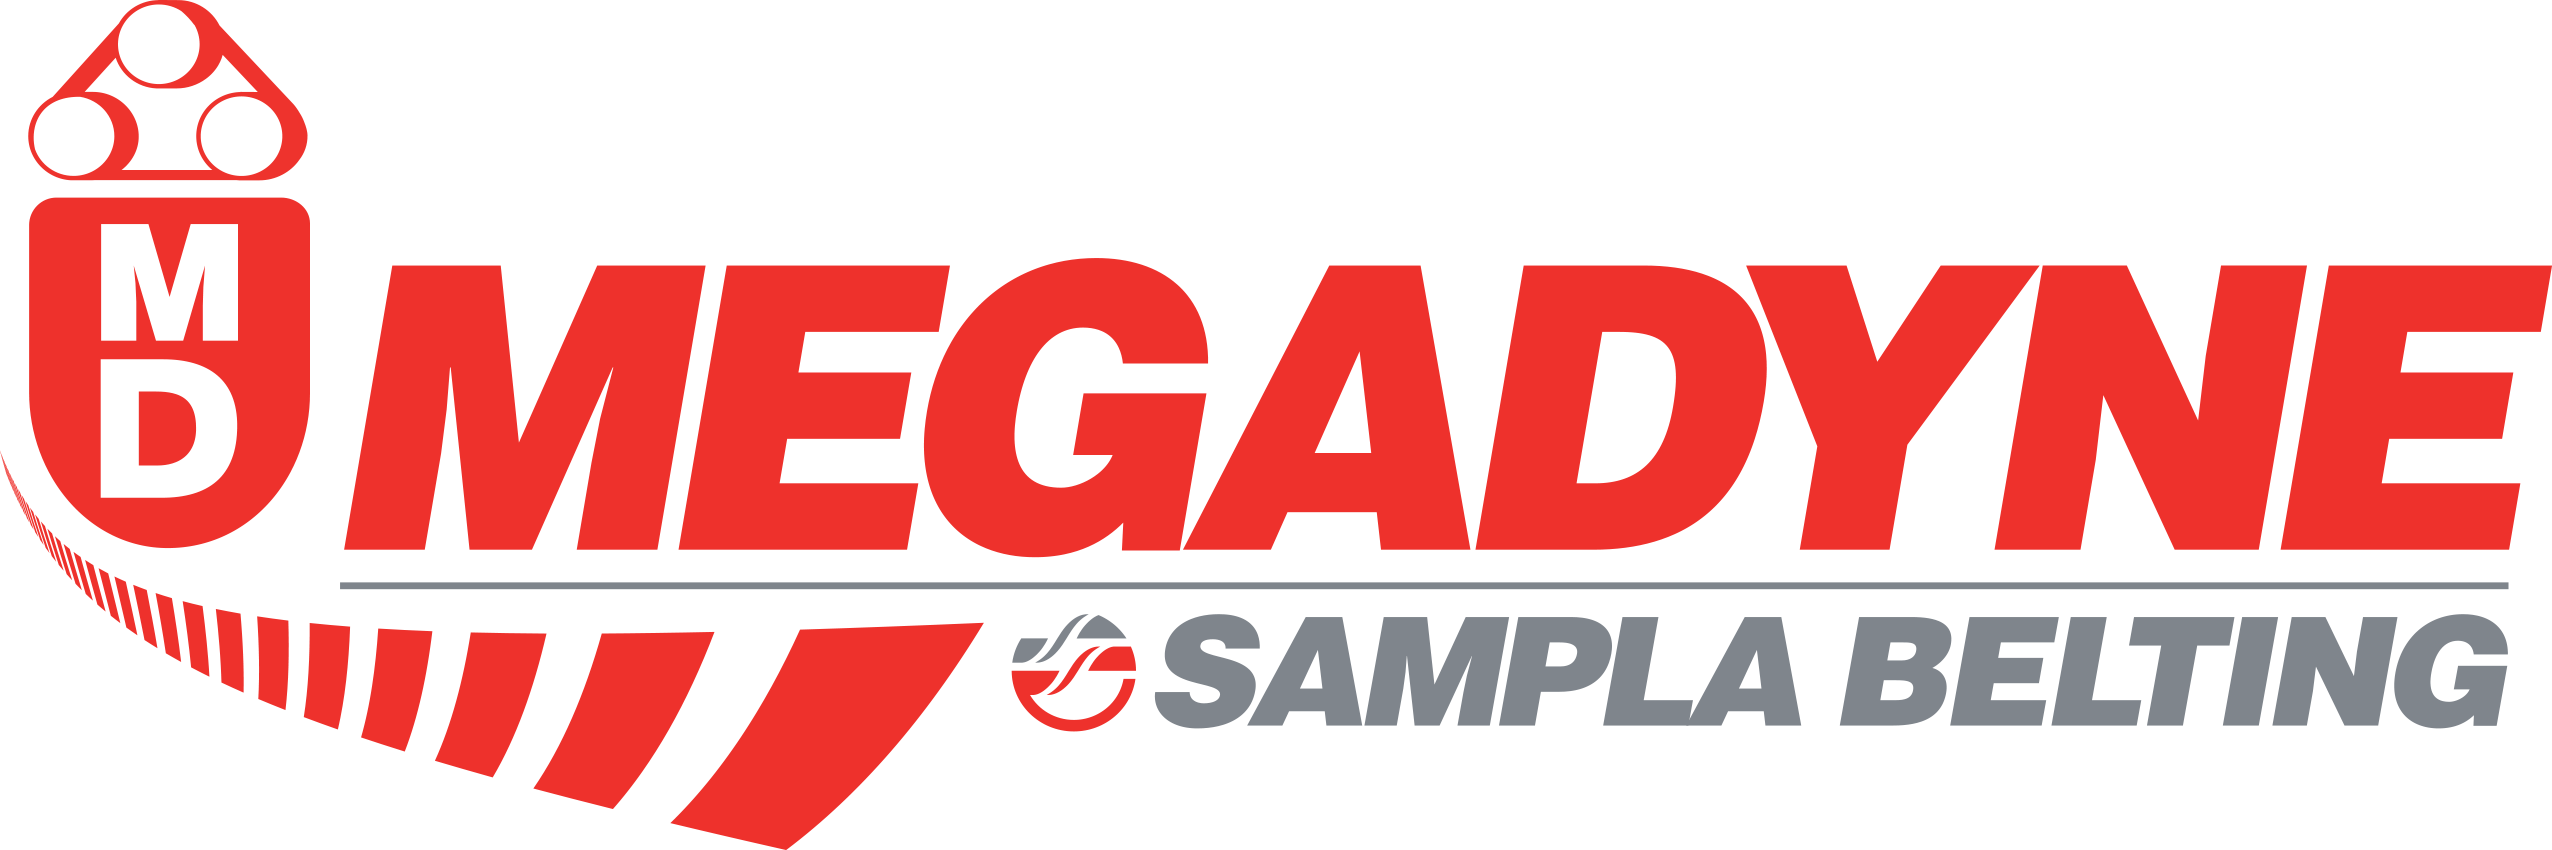 MEGADYNE SAMPLA LOGO (CMYK)